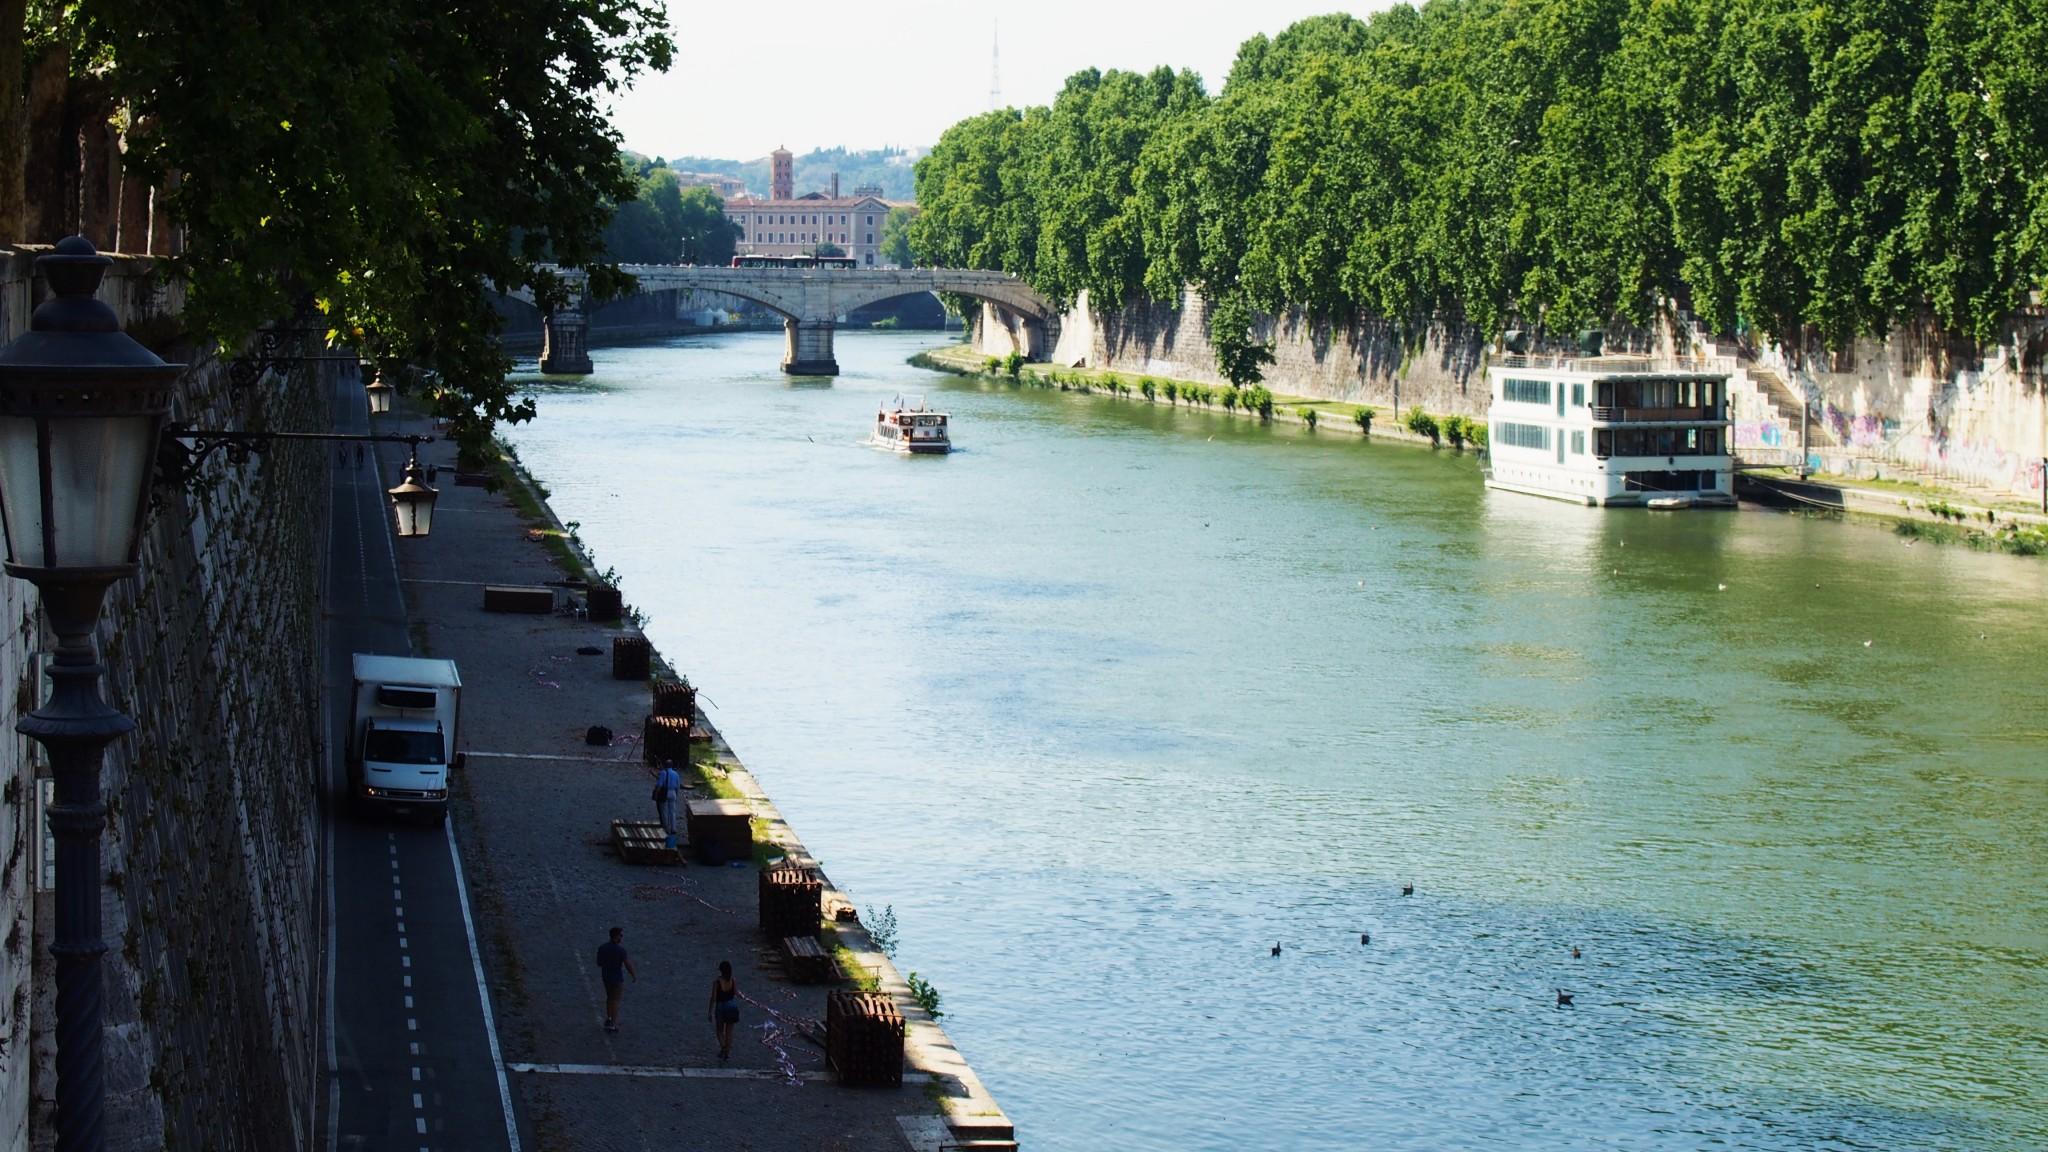 Tiber joki Rooma